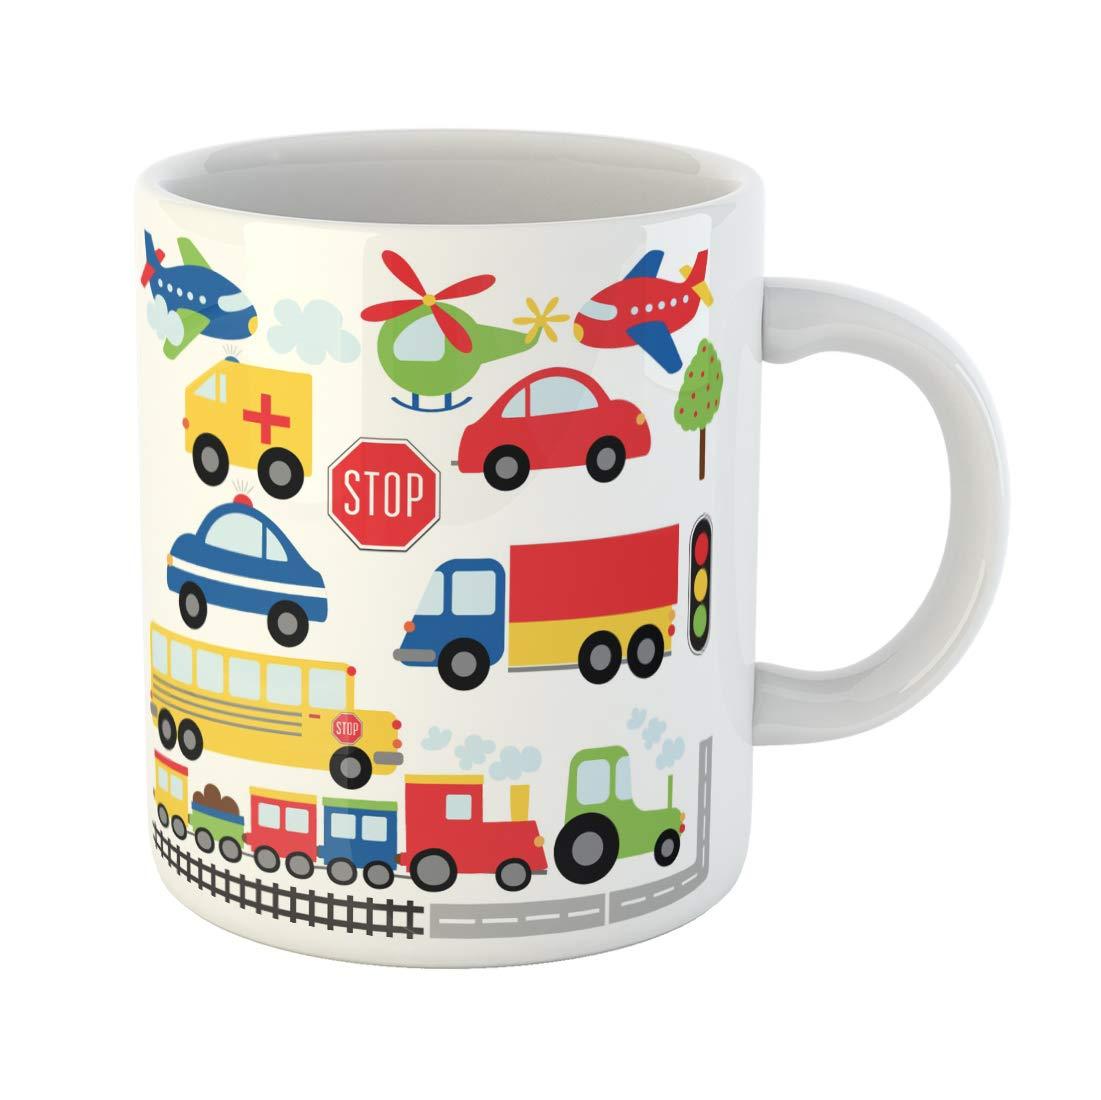 Funny coffee mug clipart transparent library Amazon.com: Semtomn Funny Coffee Mug Train Car Toy Plane Clipart ... transparent library